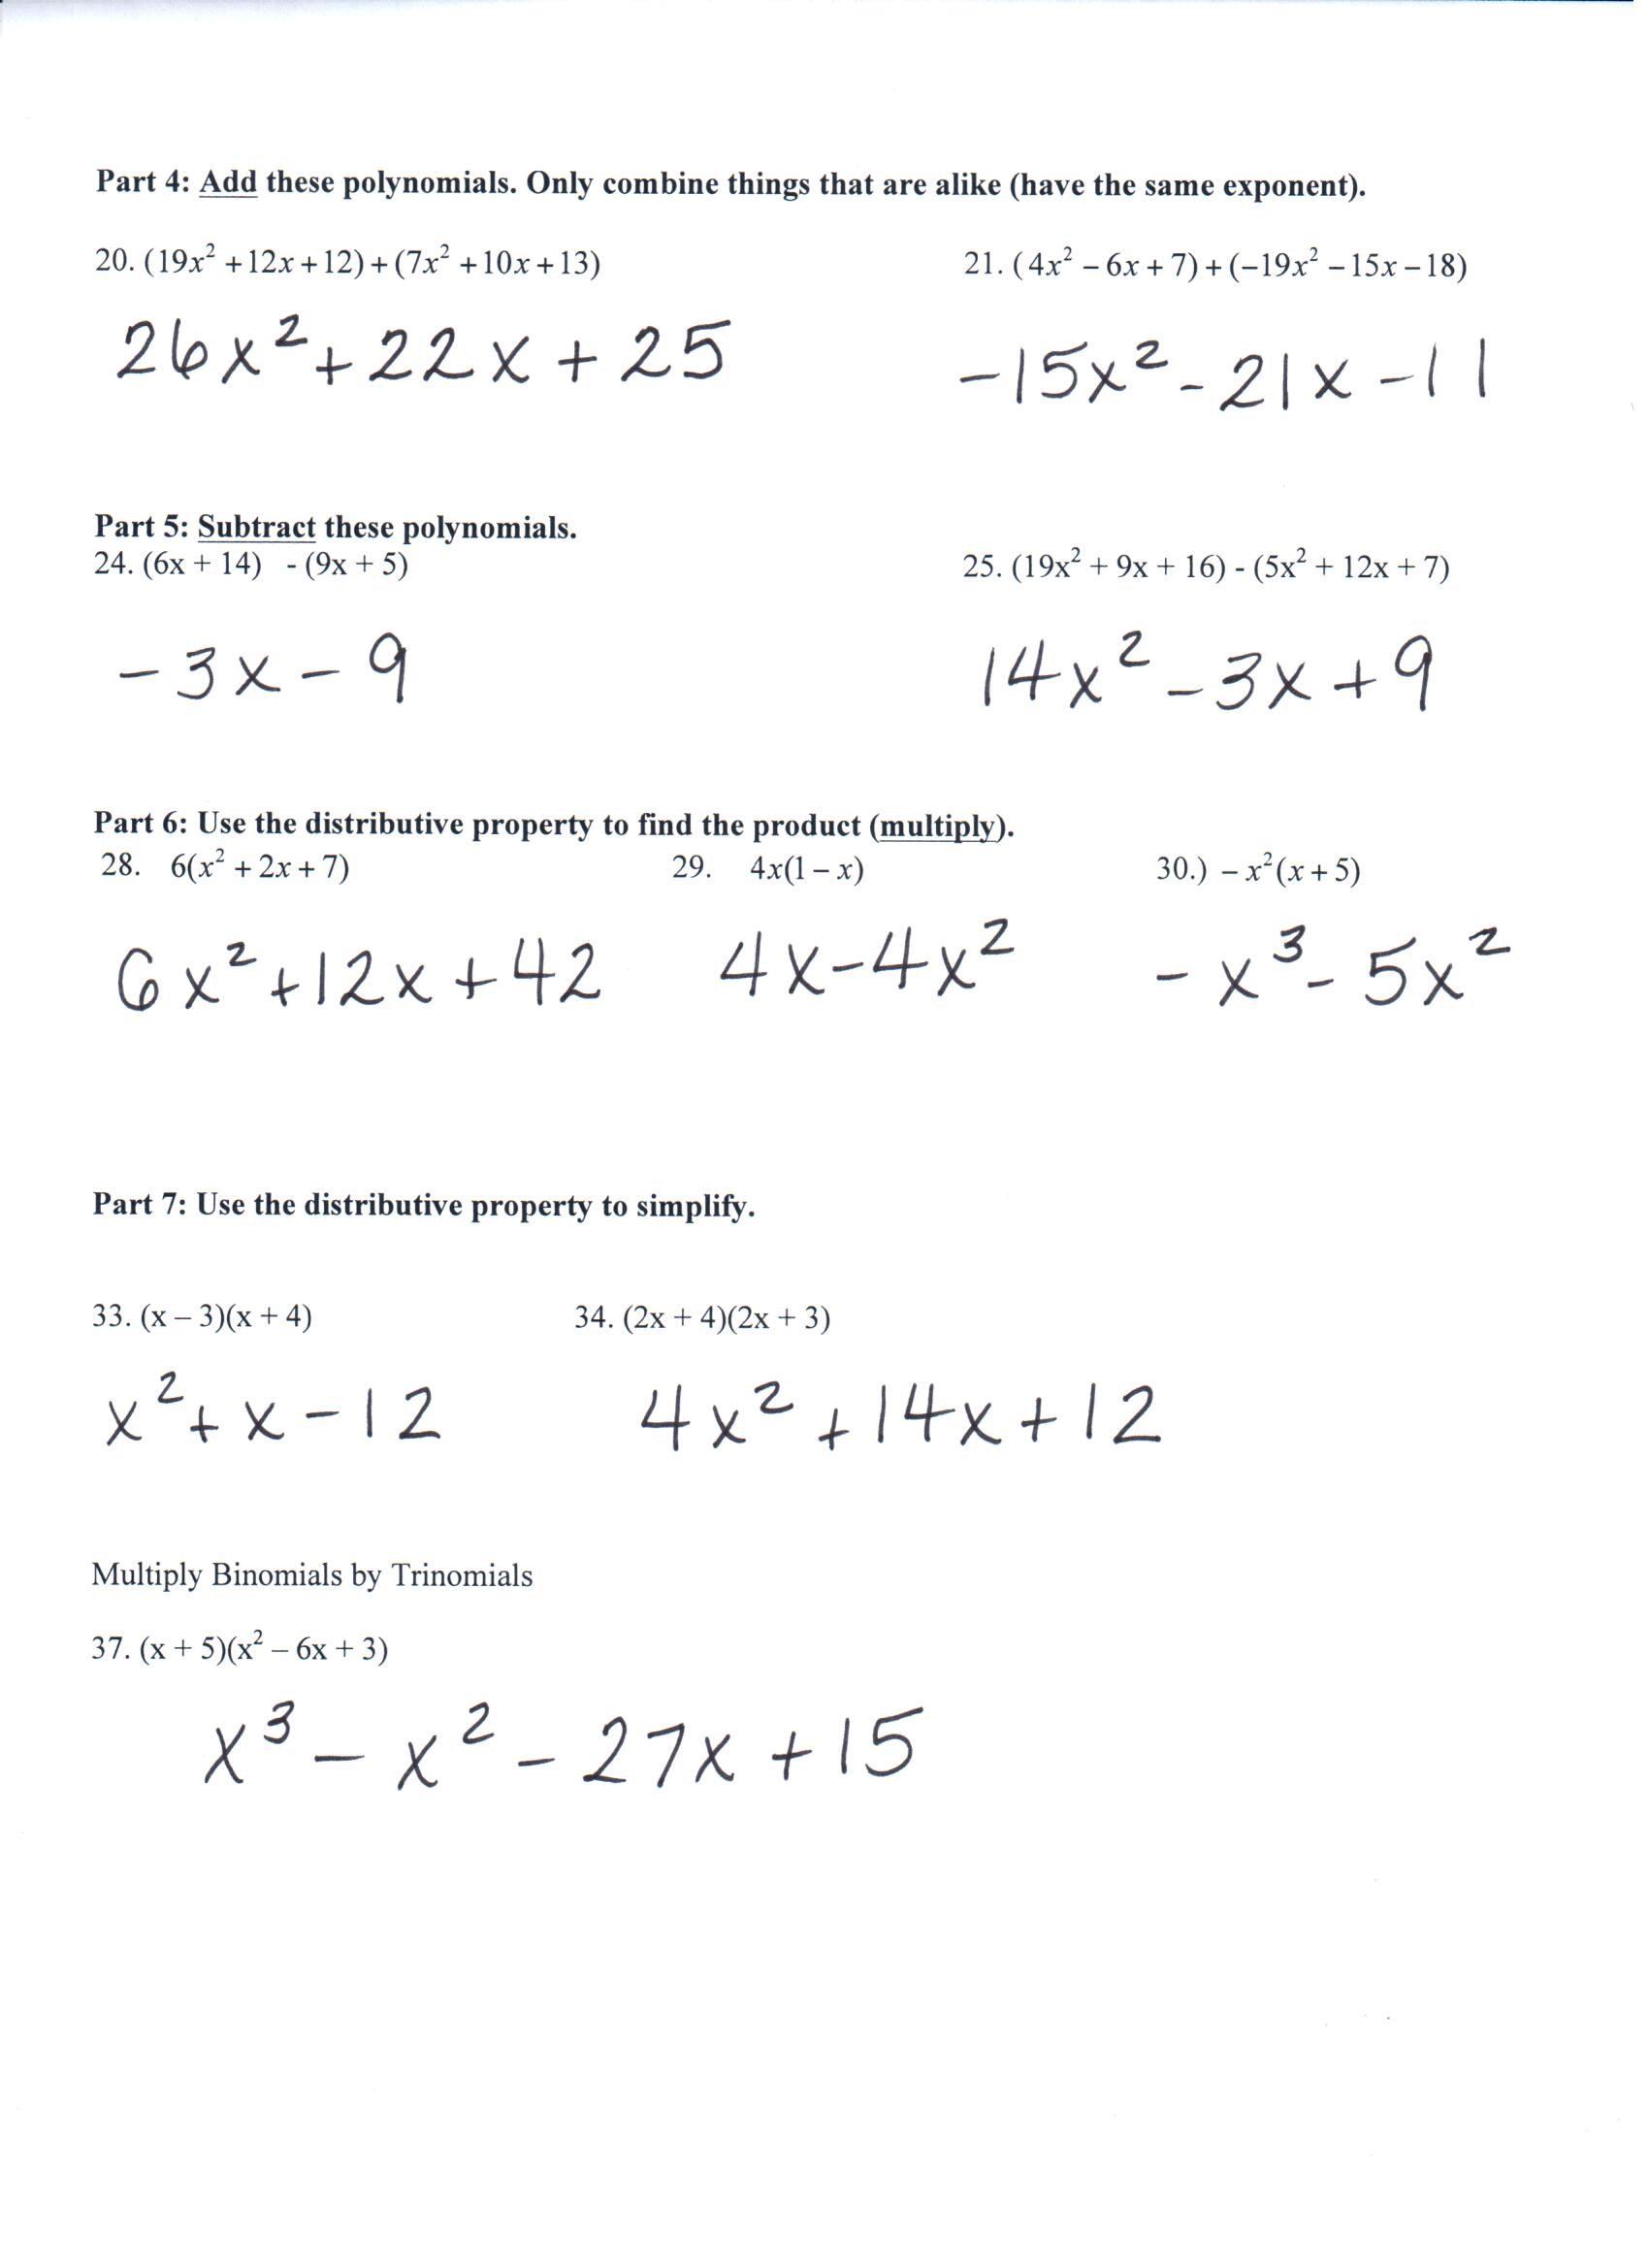 worksheet Dimensional Analysis Worksheet Key dimensional analysis worksheet 1 free worksheets library download other popular worksheets